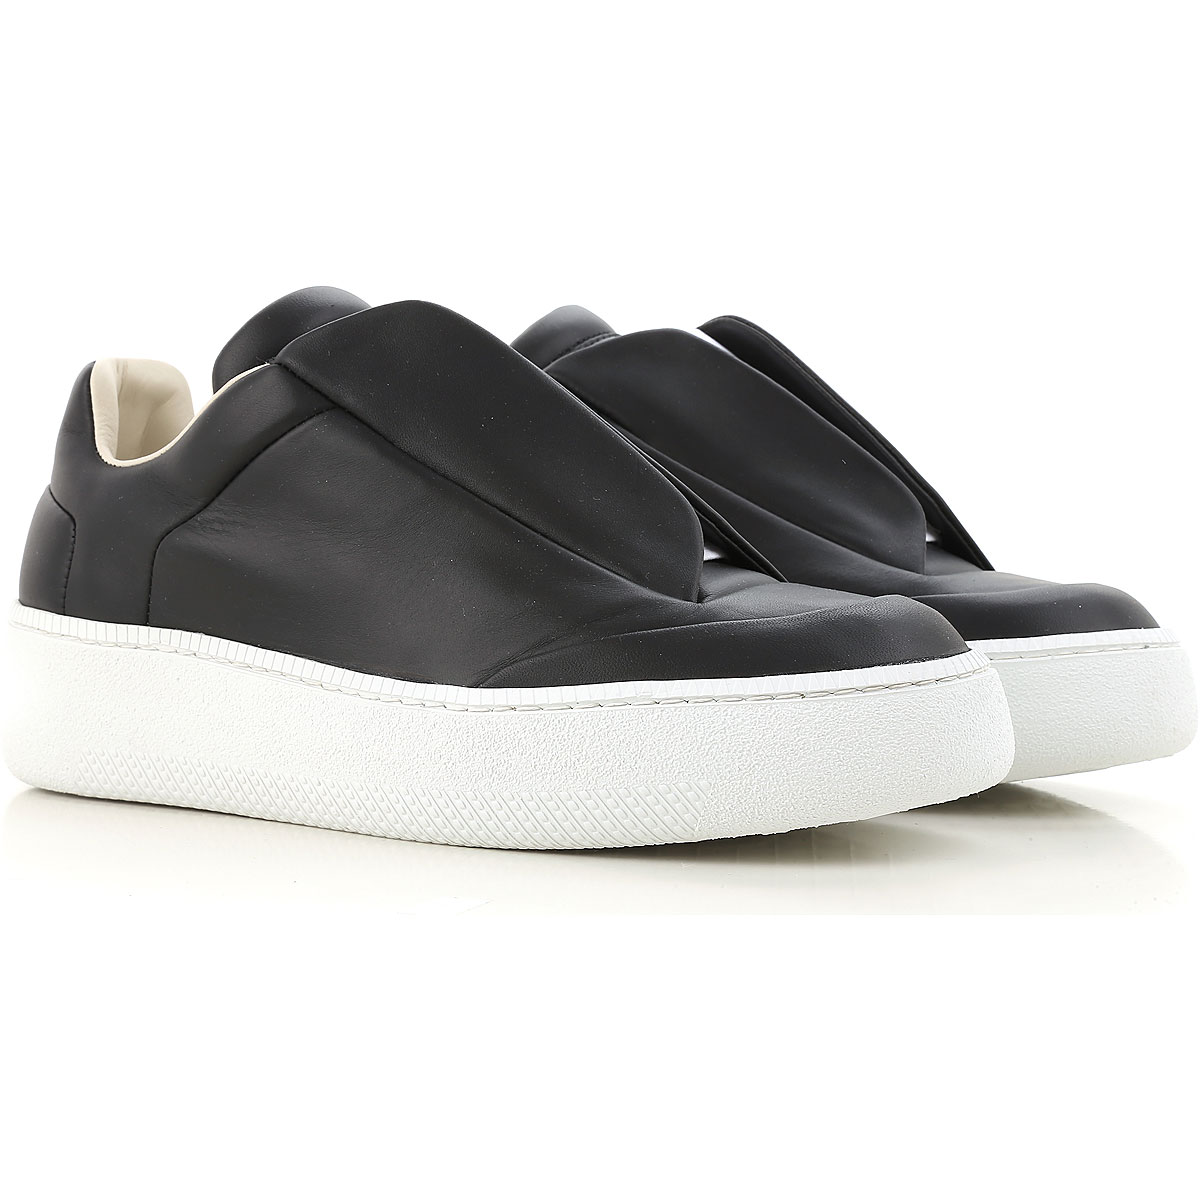 Sneakers for Men On Sale, Black, Leather, 2017, 6.5 6.75 8.5 Maison Martin Margiela